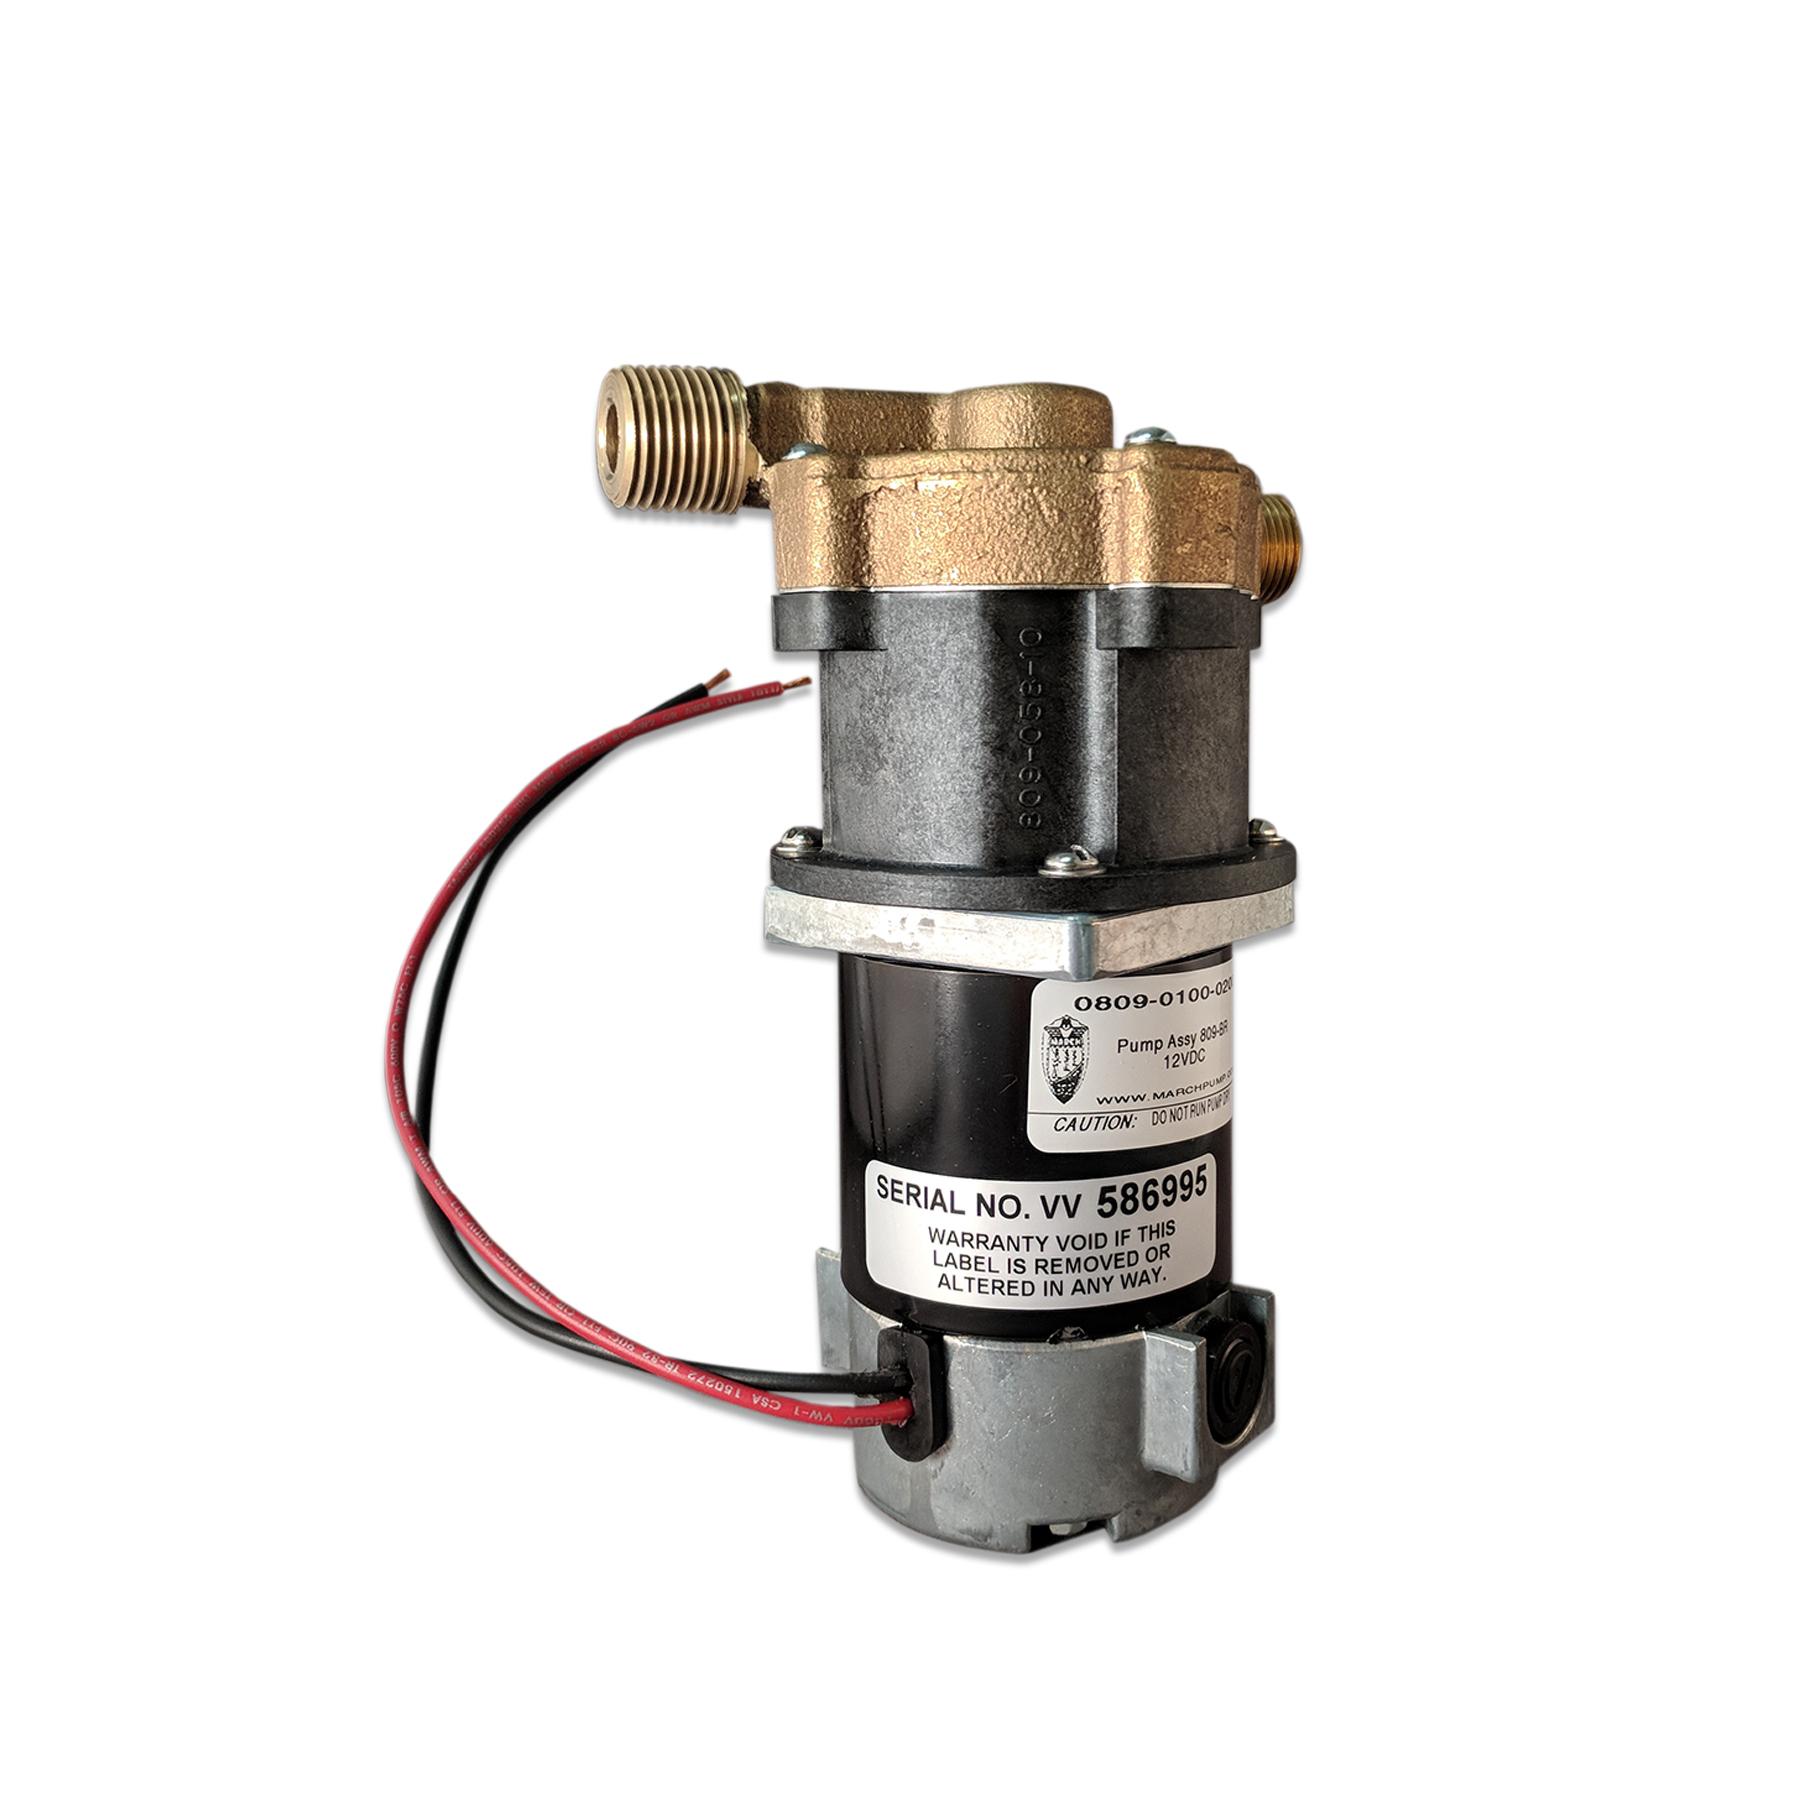 BR-809 Circulation Pump, 12VDC